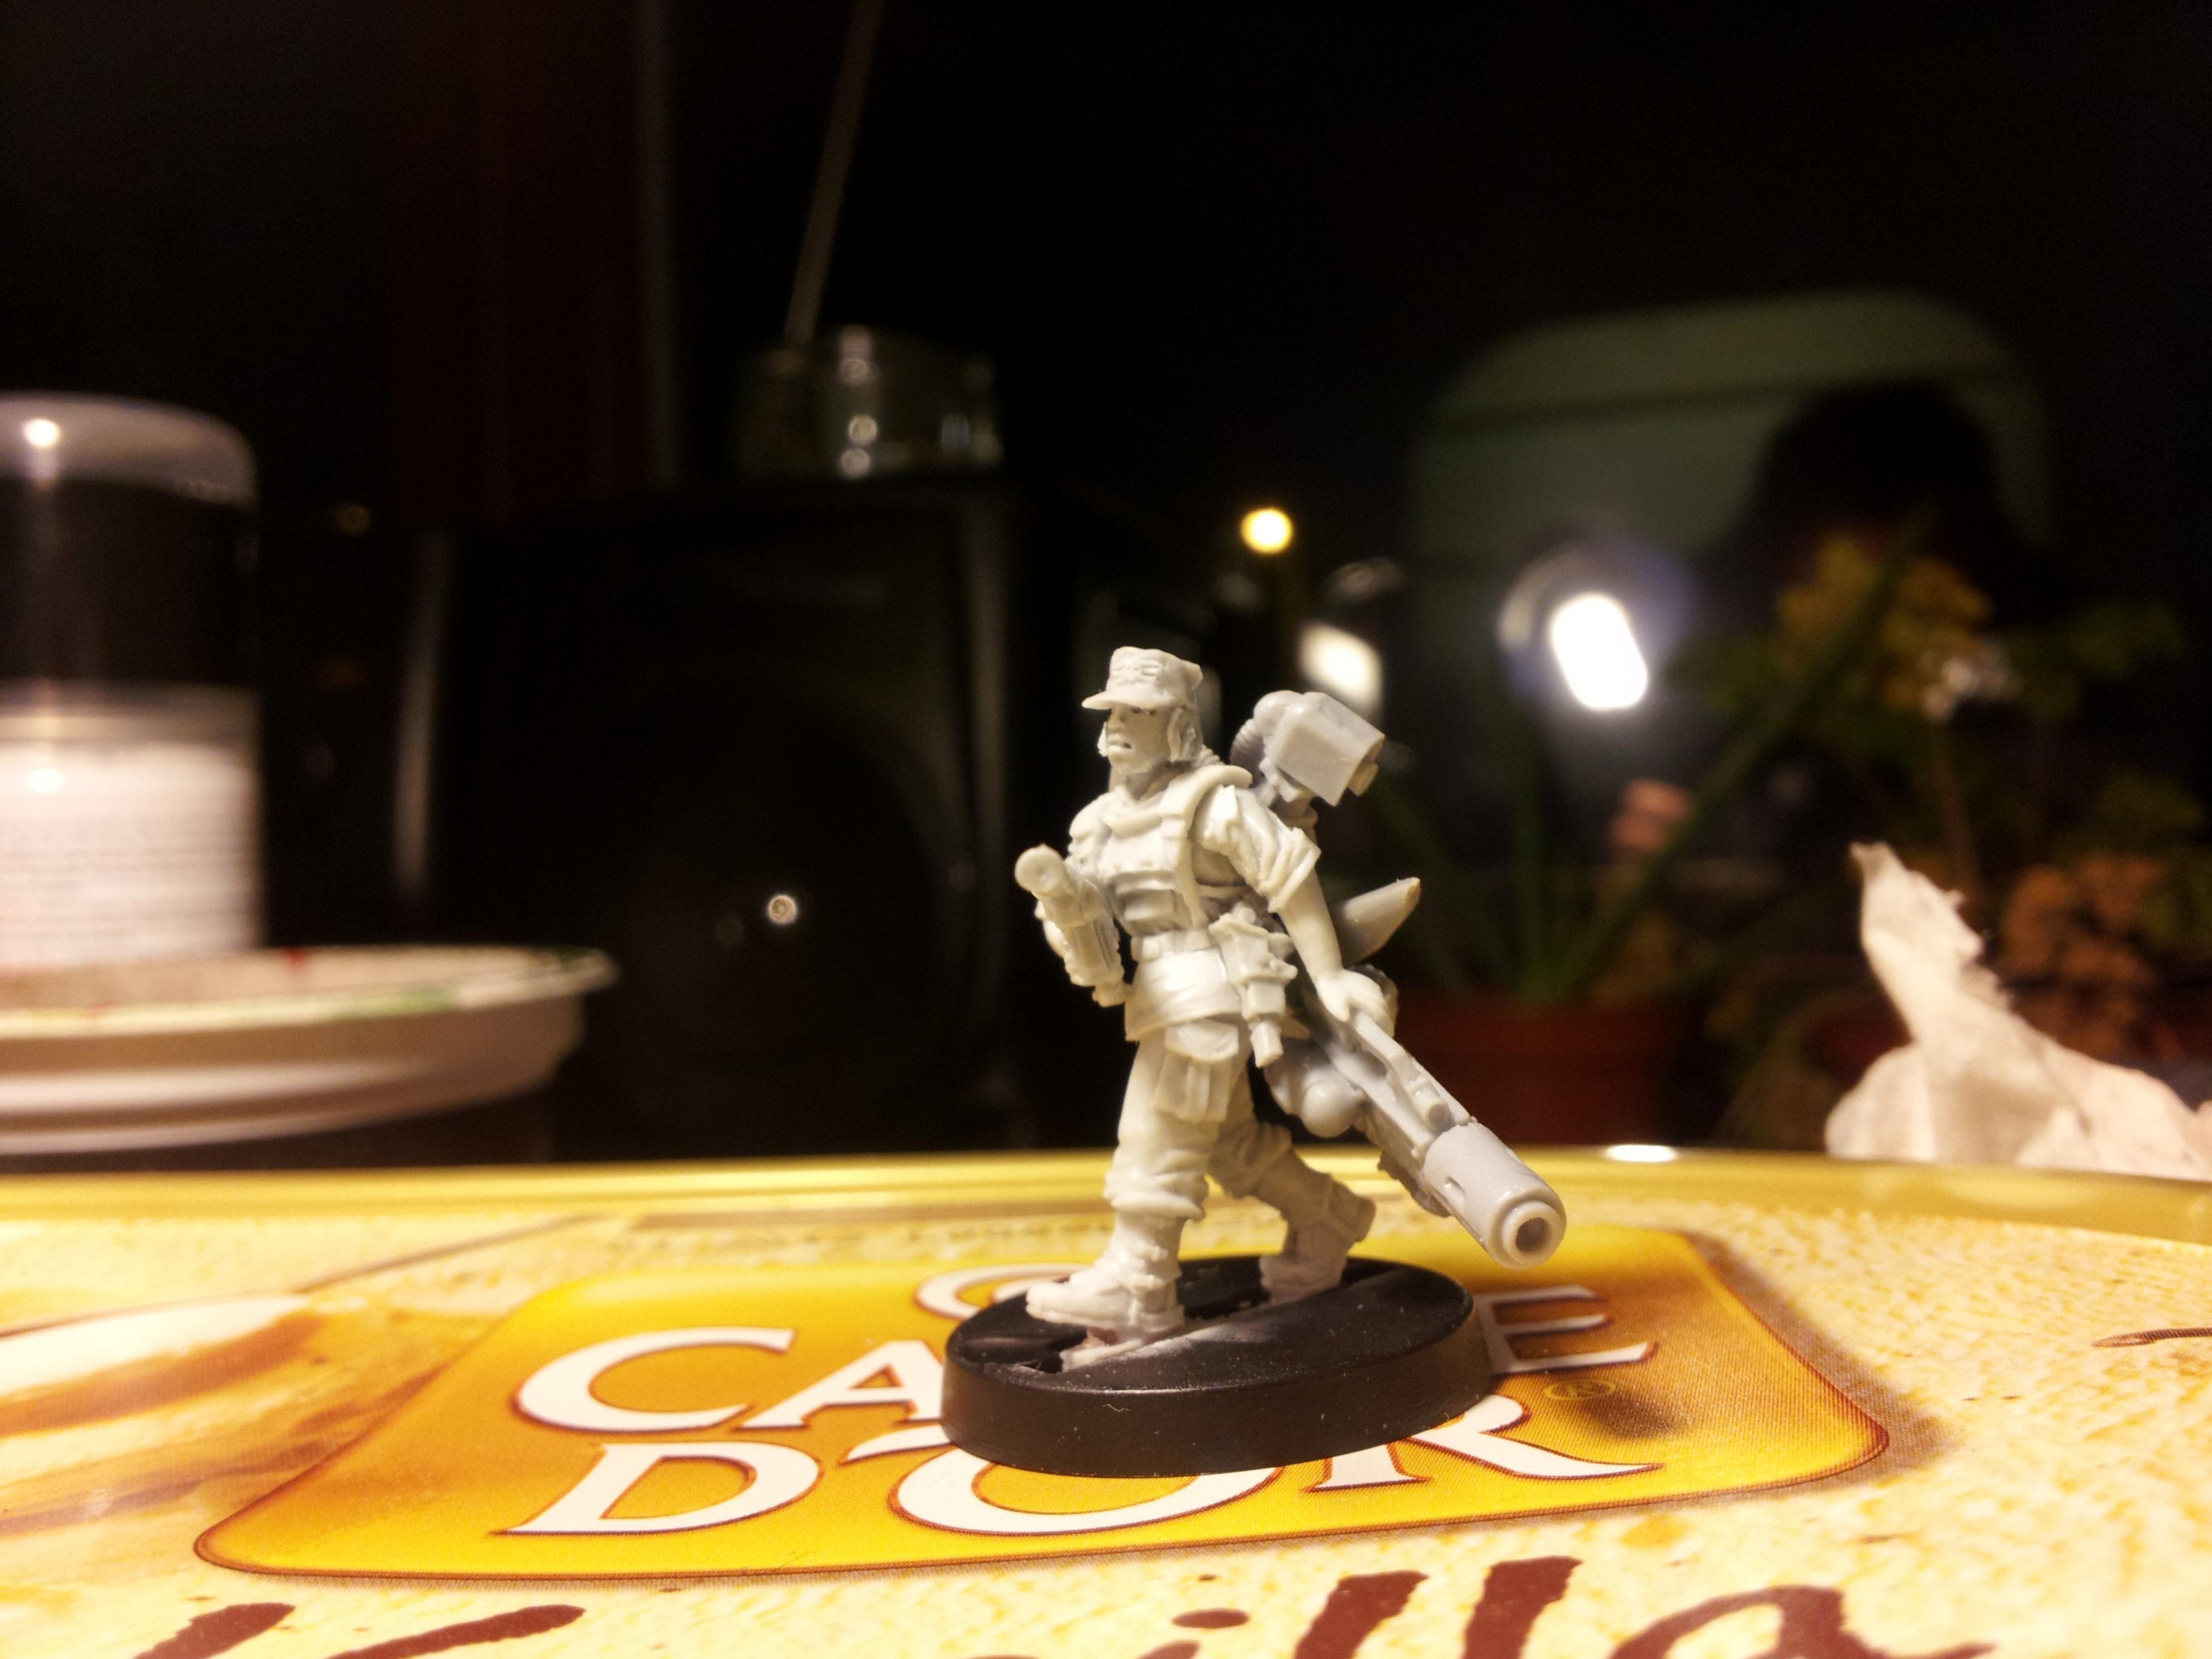 Female, Gang, Imperial Guard, Inquisimunda, Kill Team, Necromunda, Vic, Victoria Miniatures, Warband